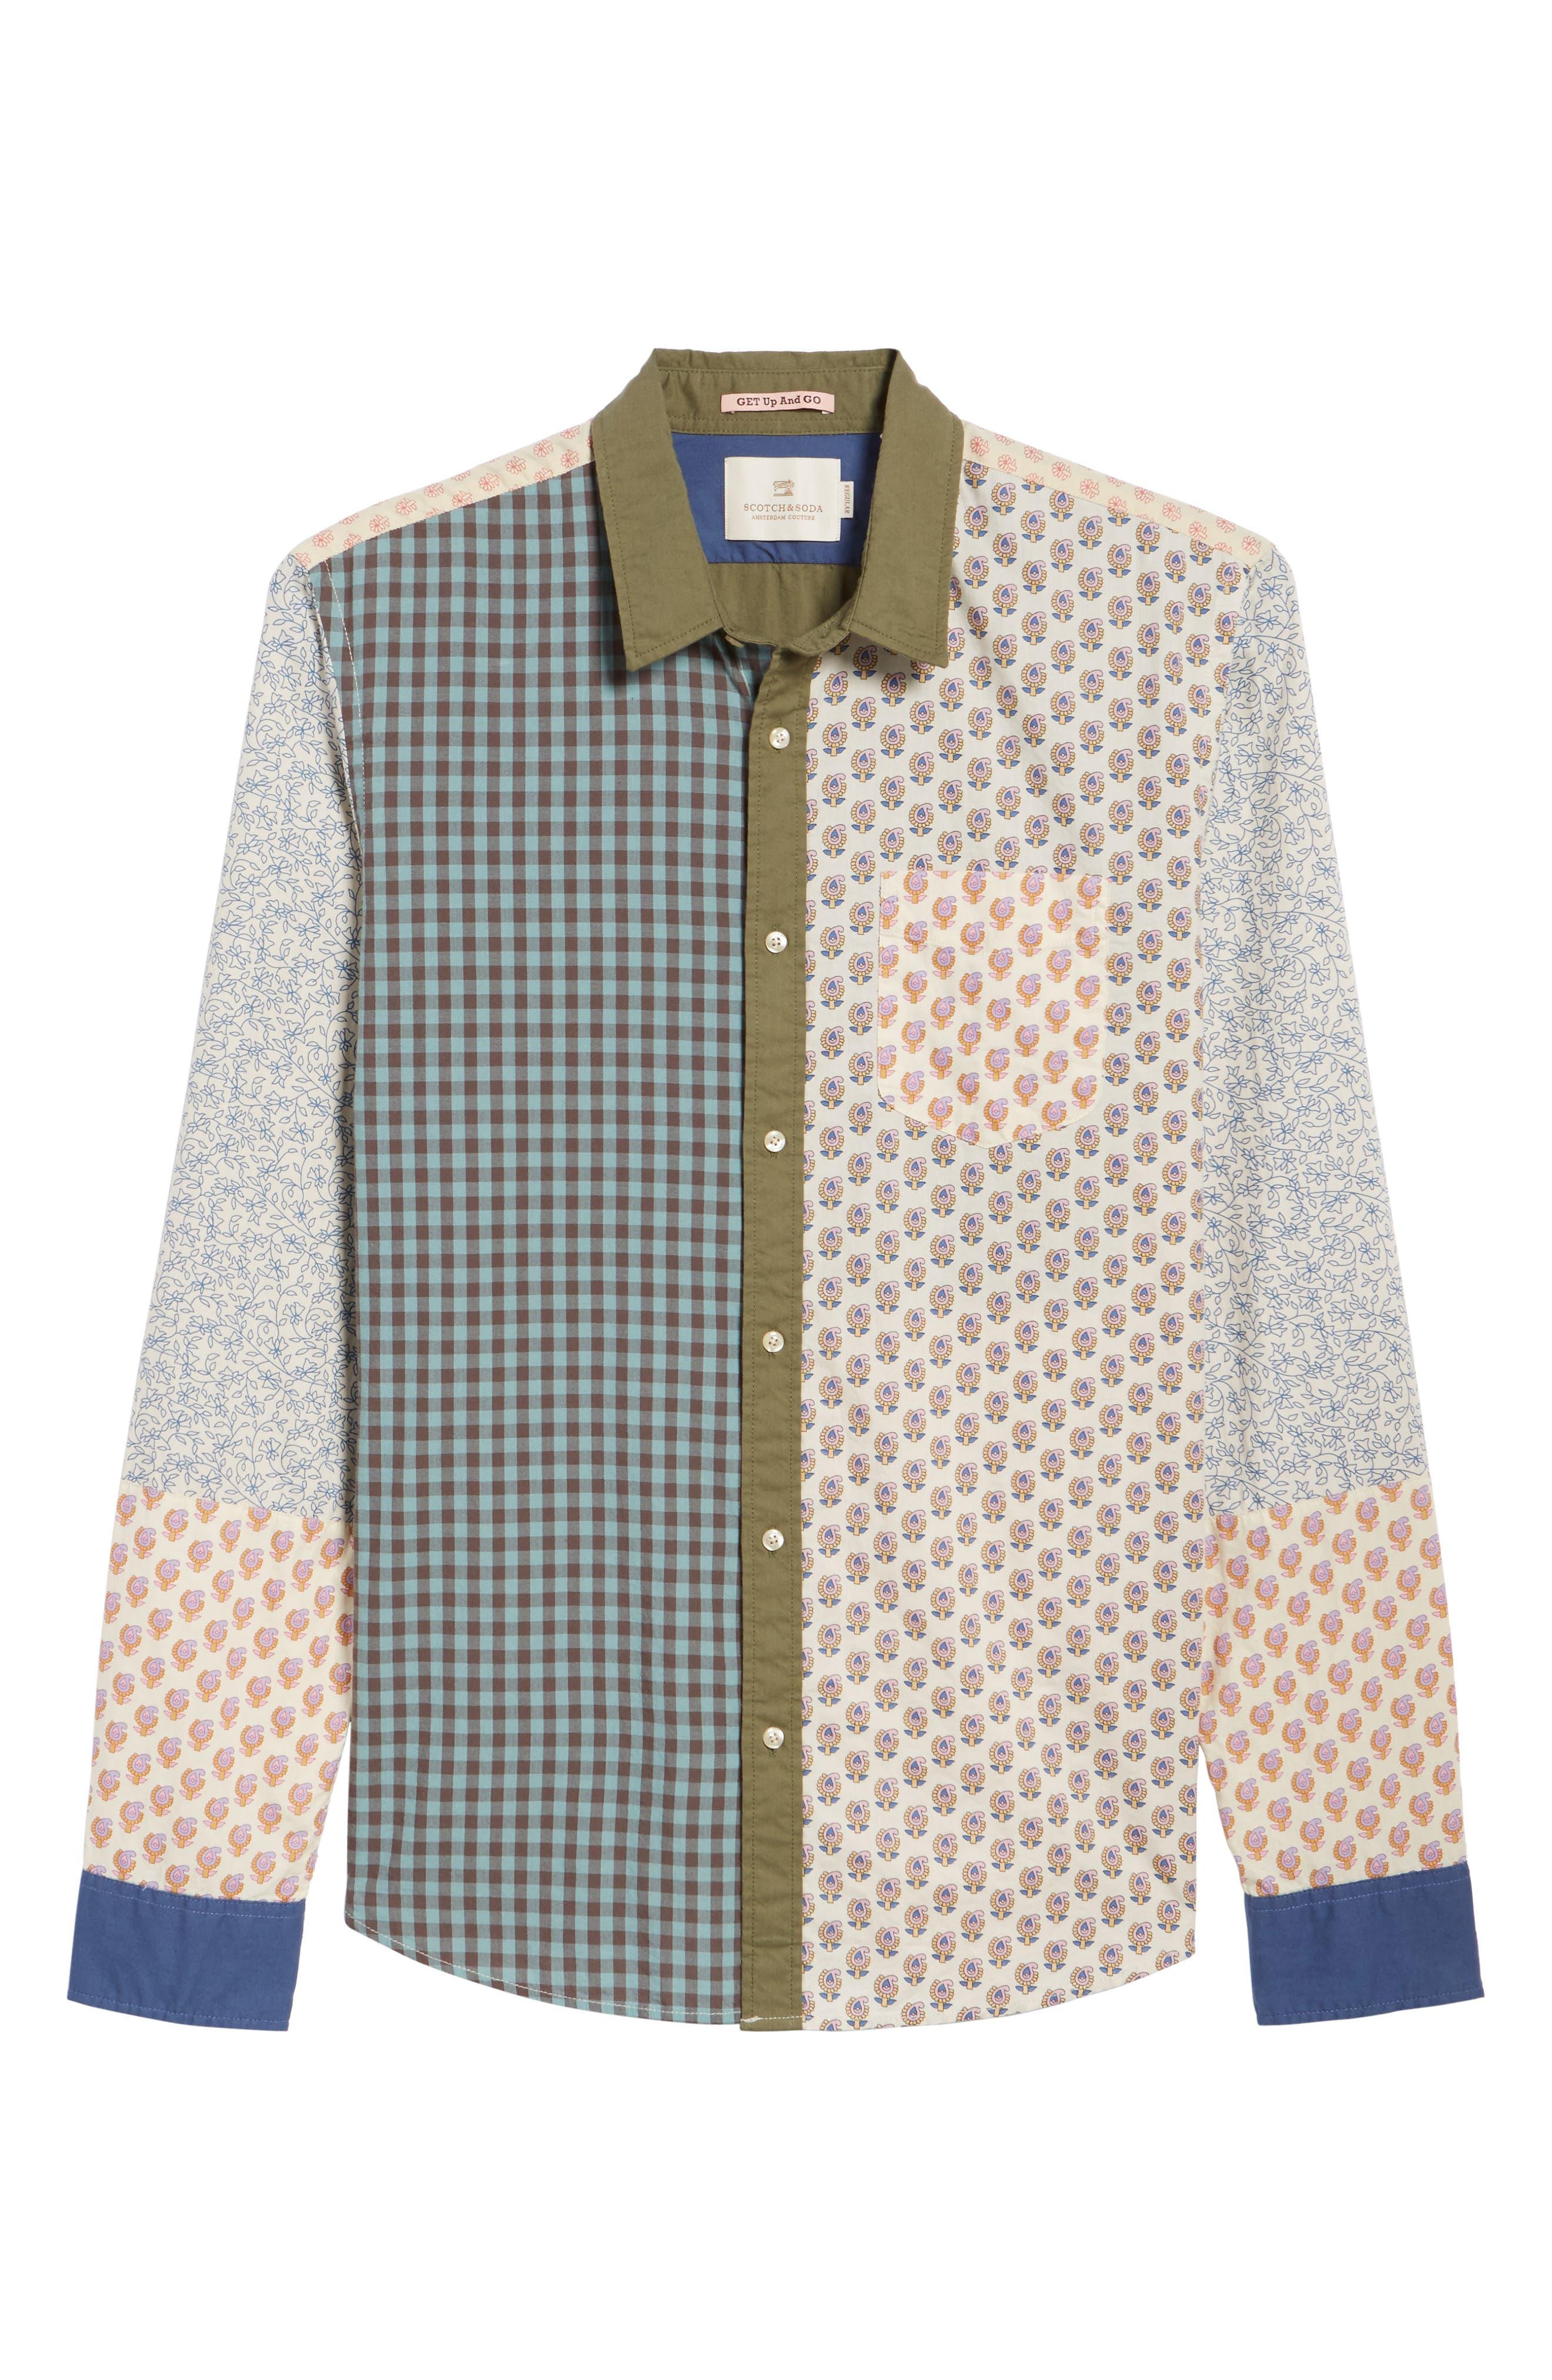 Mix & Match Sport Shirt,                             Alternate thumbnail 6, color,                             Combo A